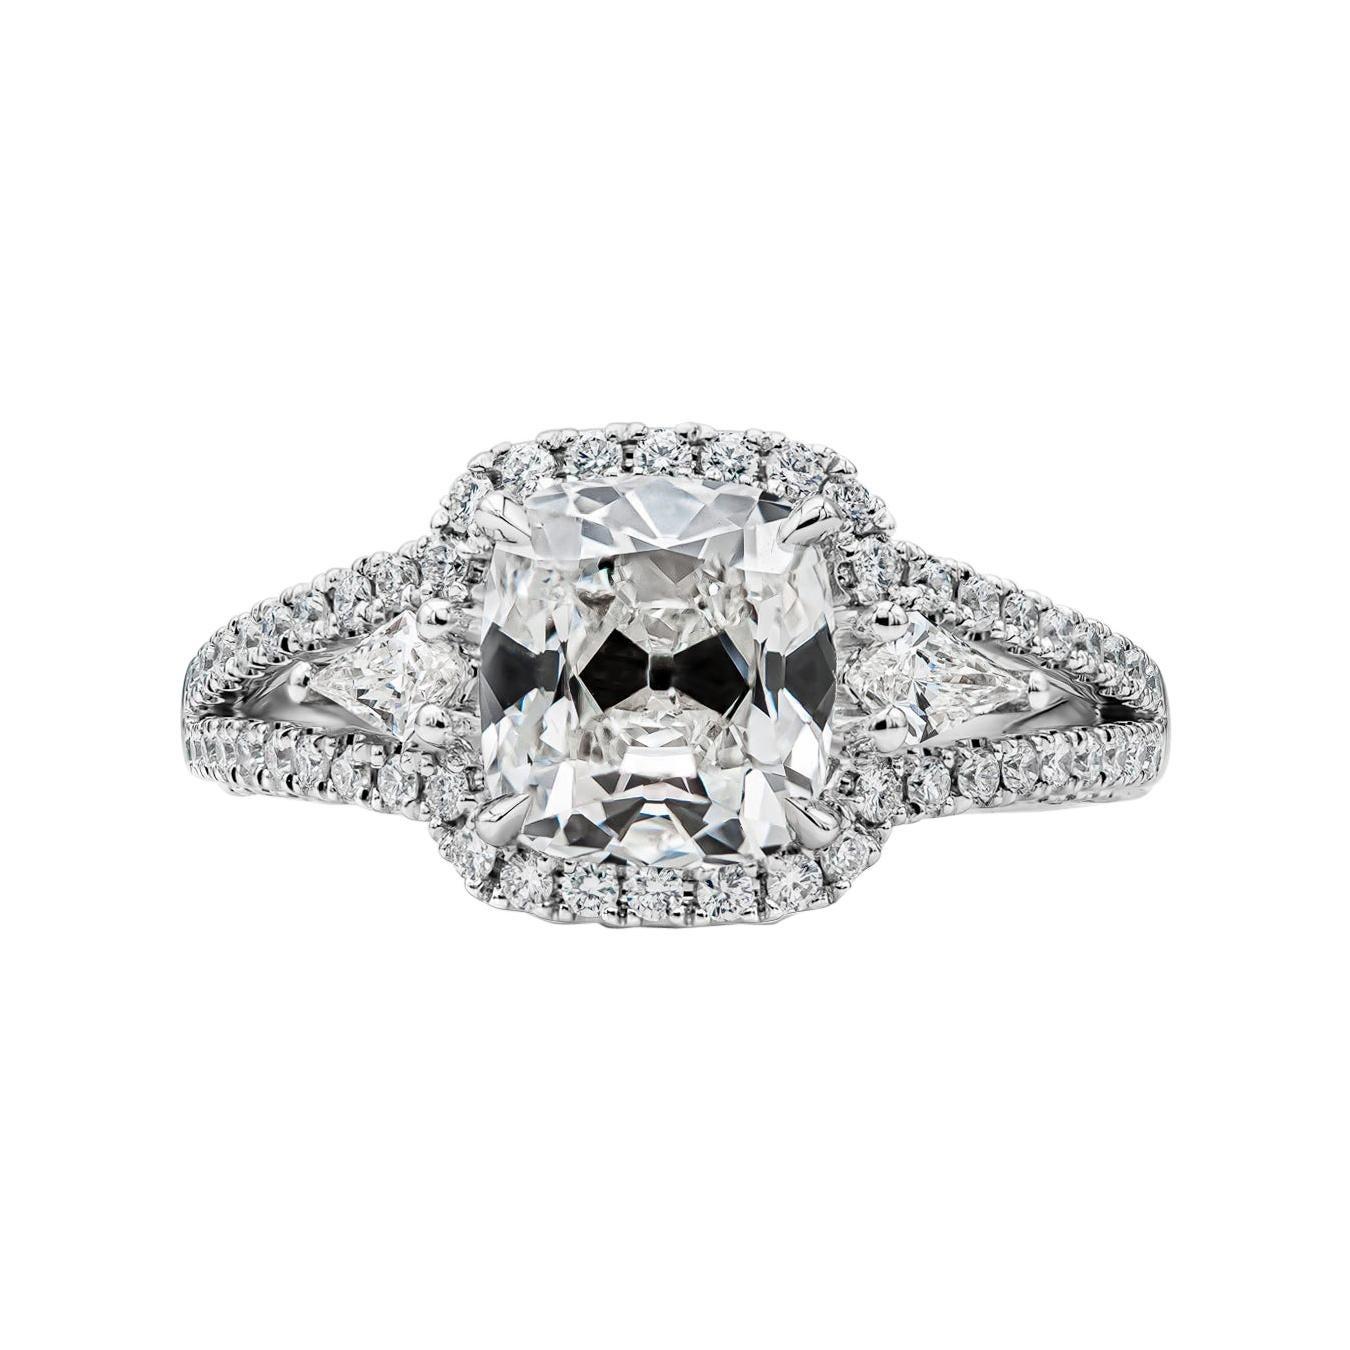 GIA Certified 2.22 Carat Cushion Cut Diamond Three-Stone Halo Engagement Ring